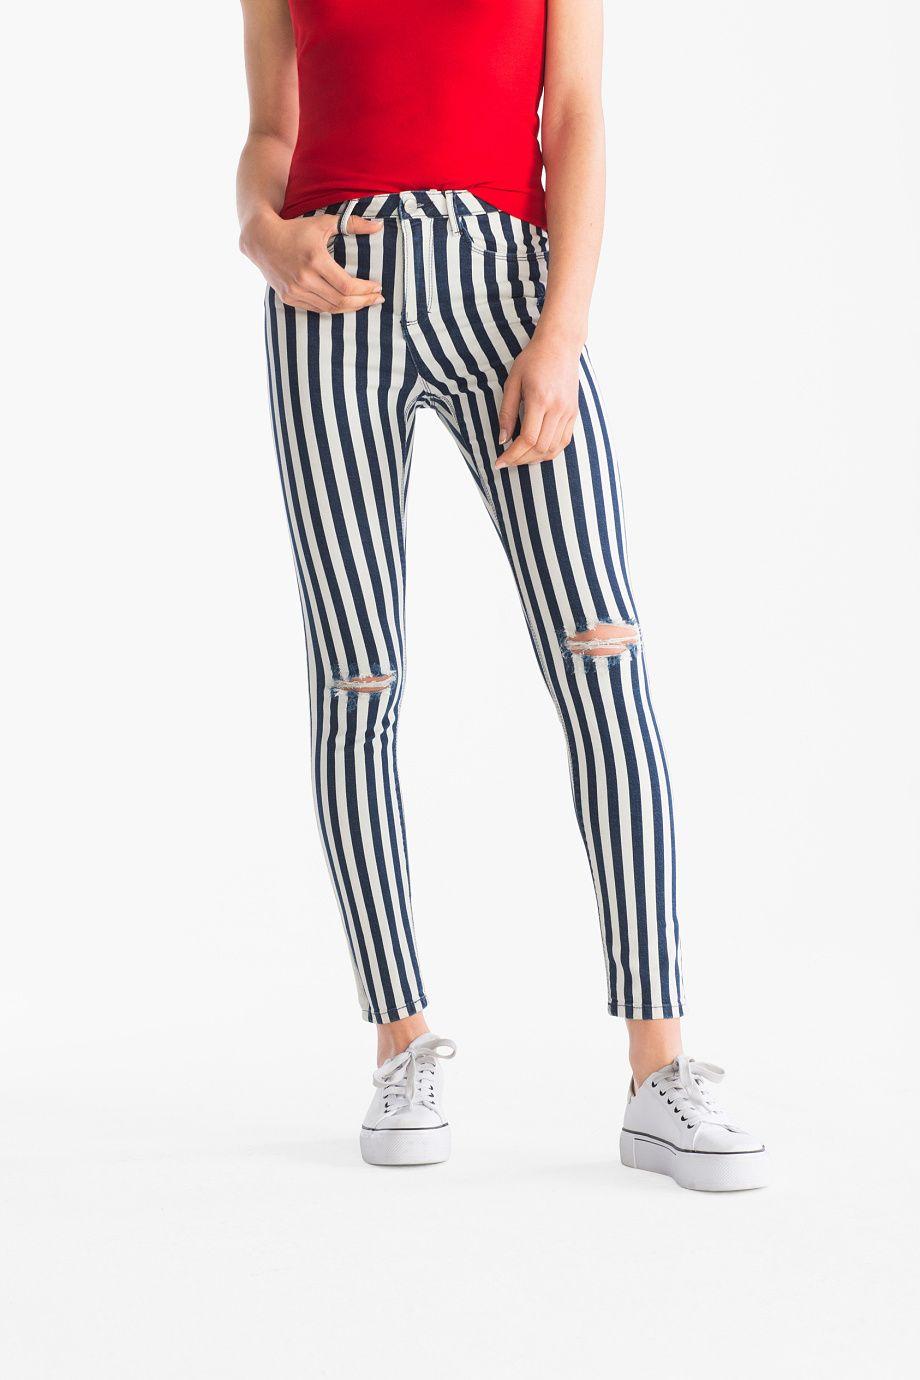 Mujer The Jegging Jeans De Rayas Azul Oscuro Blanco Casual Outfit Pantalon Rayas Ropa Casual Para Mujer